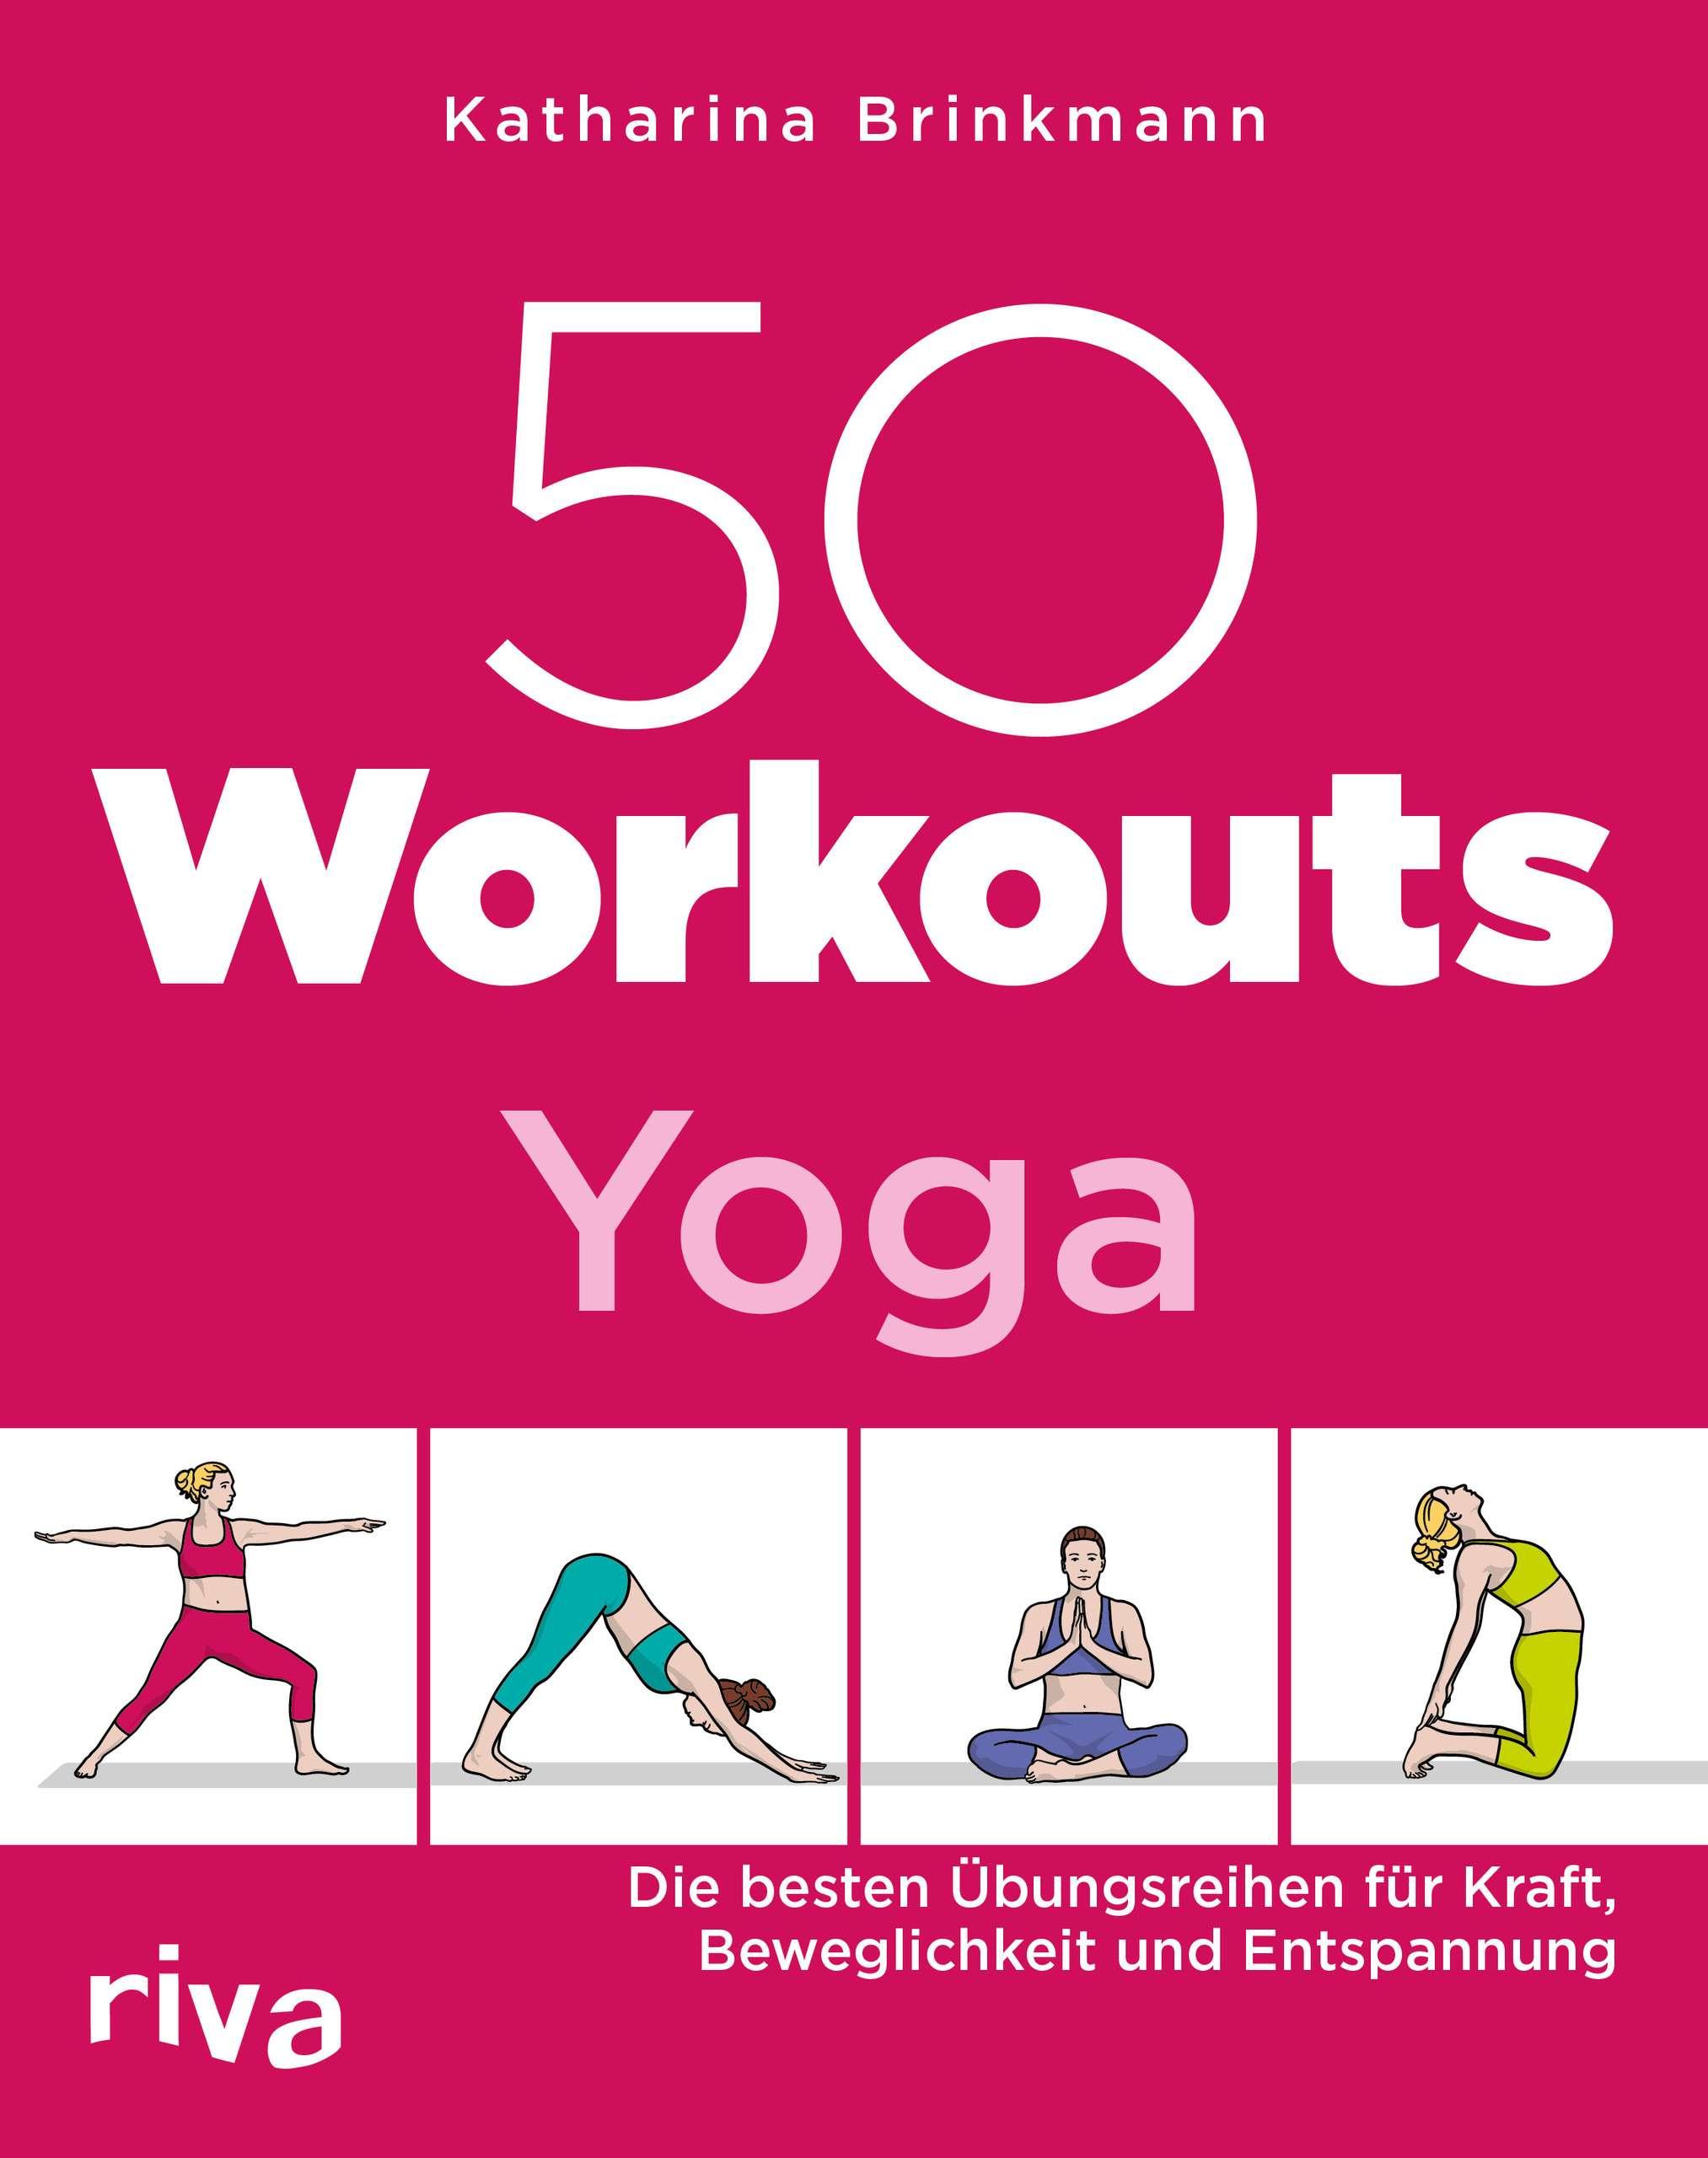 """50 Workouts Yoga"" von Katharina Brinkmann © riva"